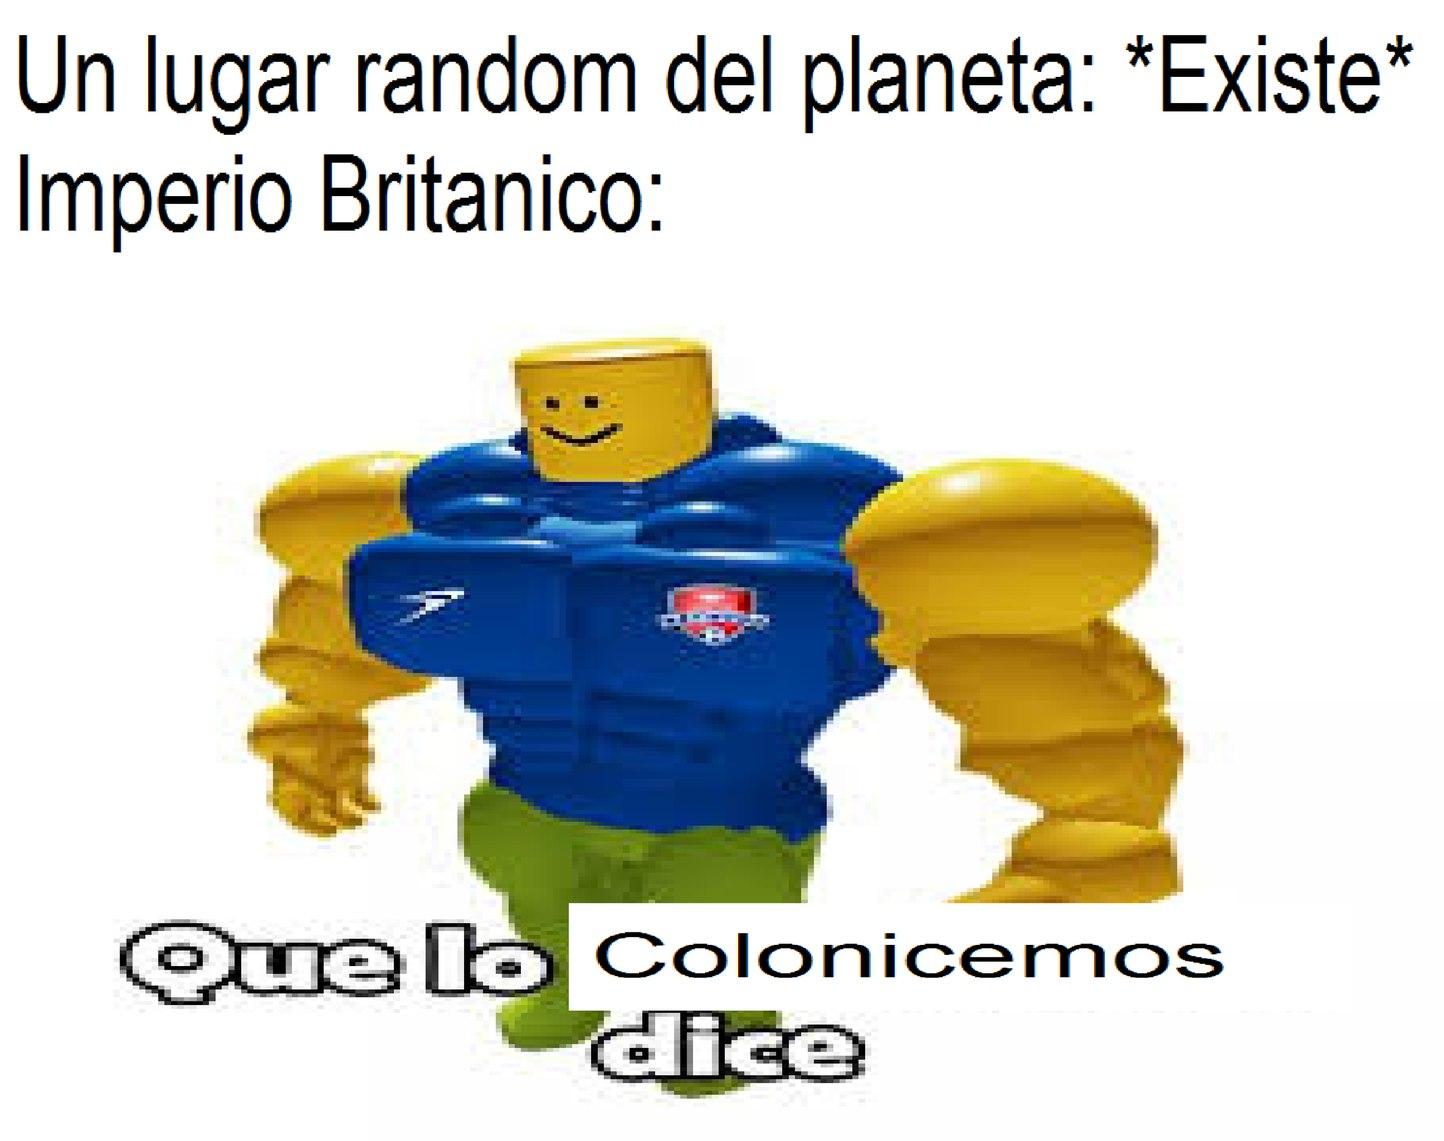 colonia - meme